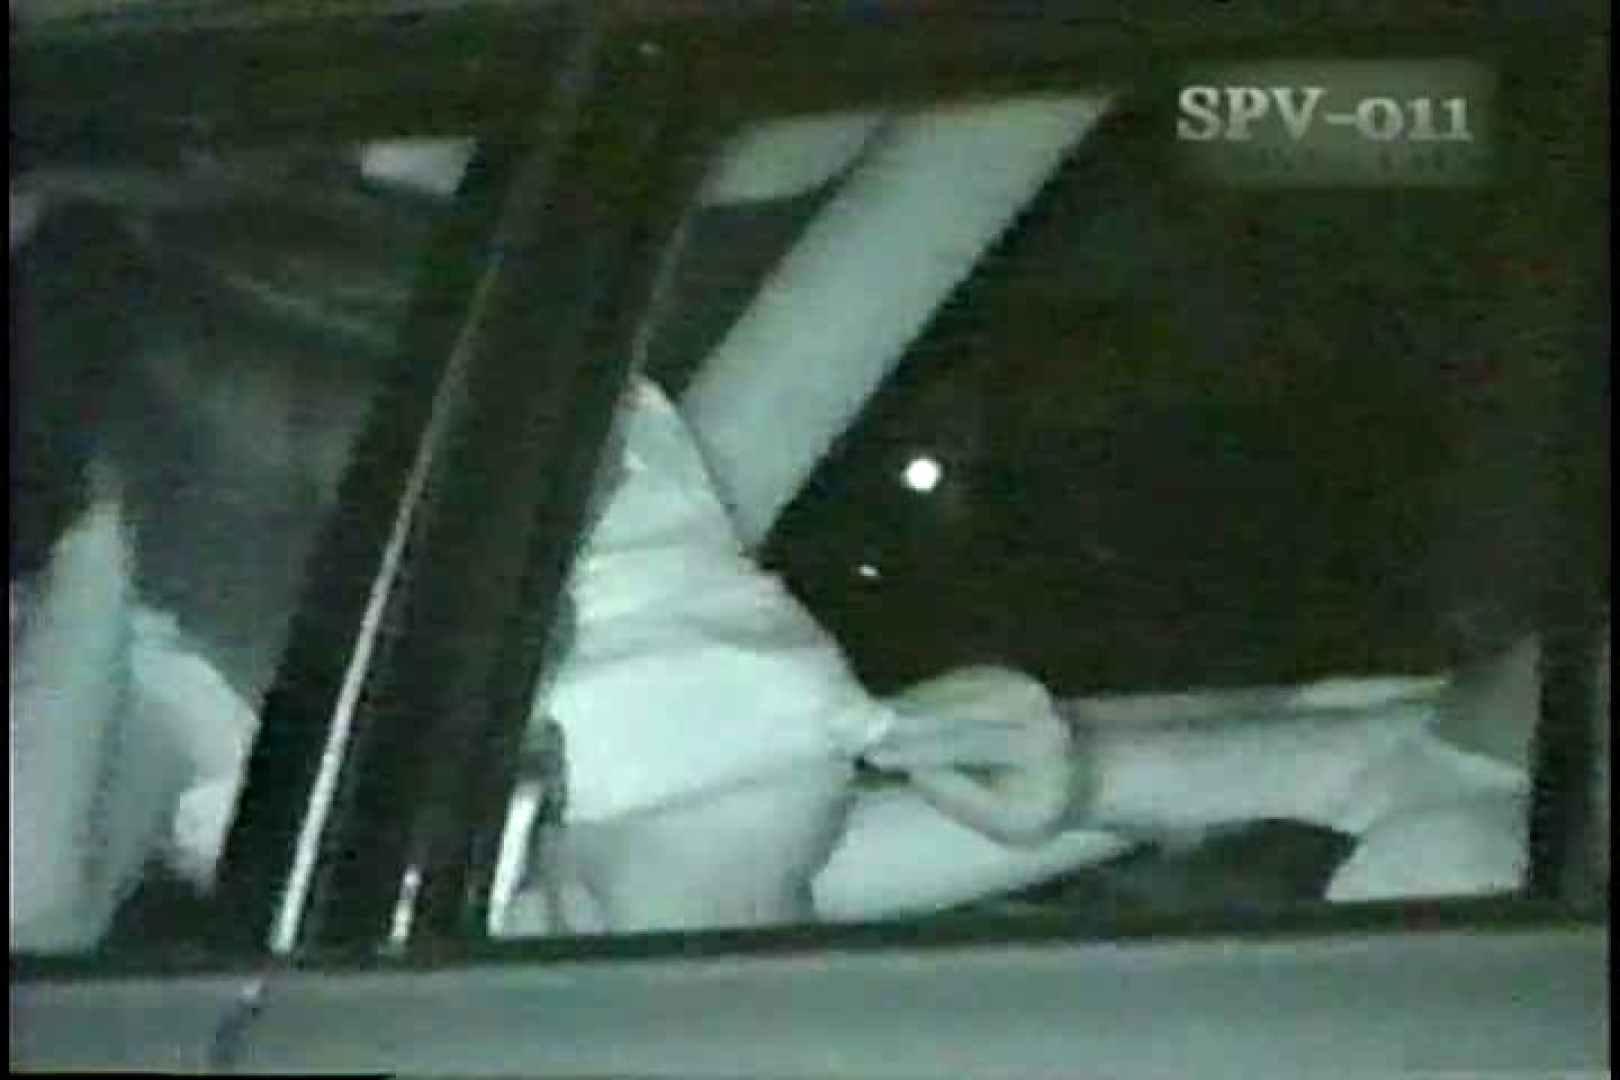 高画質版!SPD-011 盗撮 カーセックス黙示録 (VHS) 高画質 | 女体盗撮  104連発 37